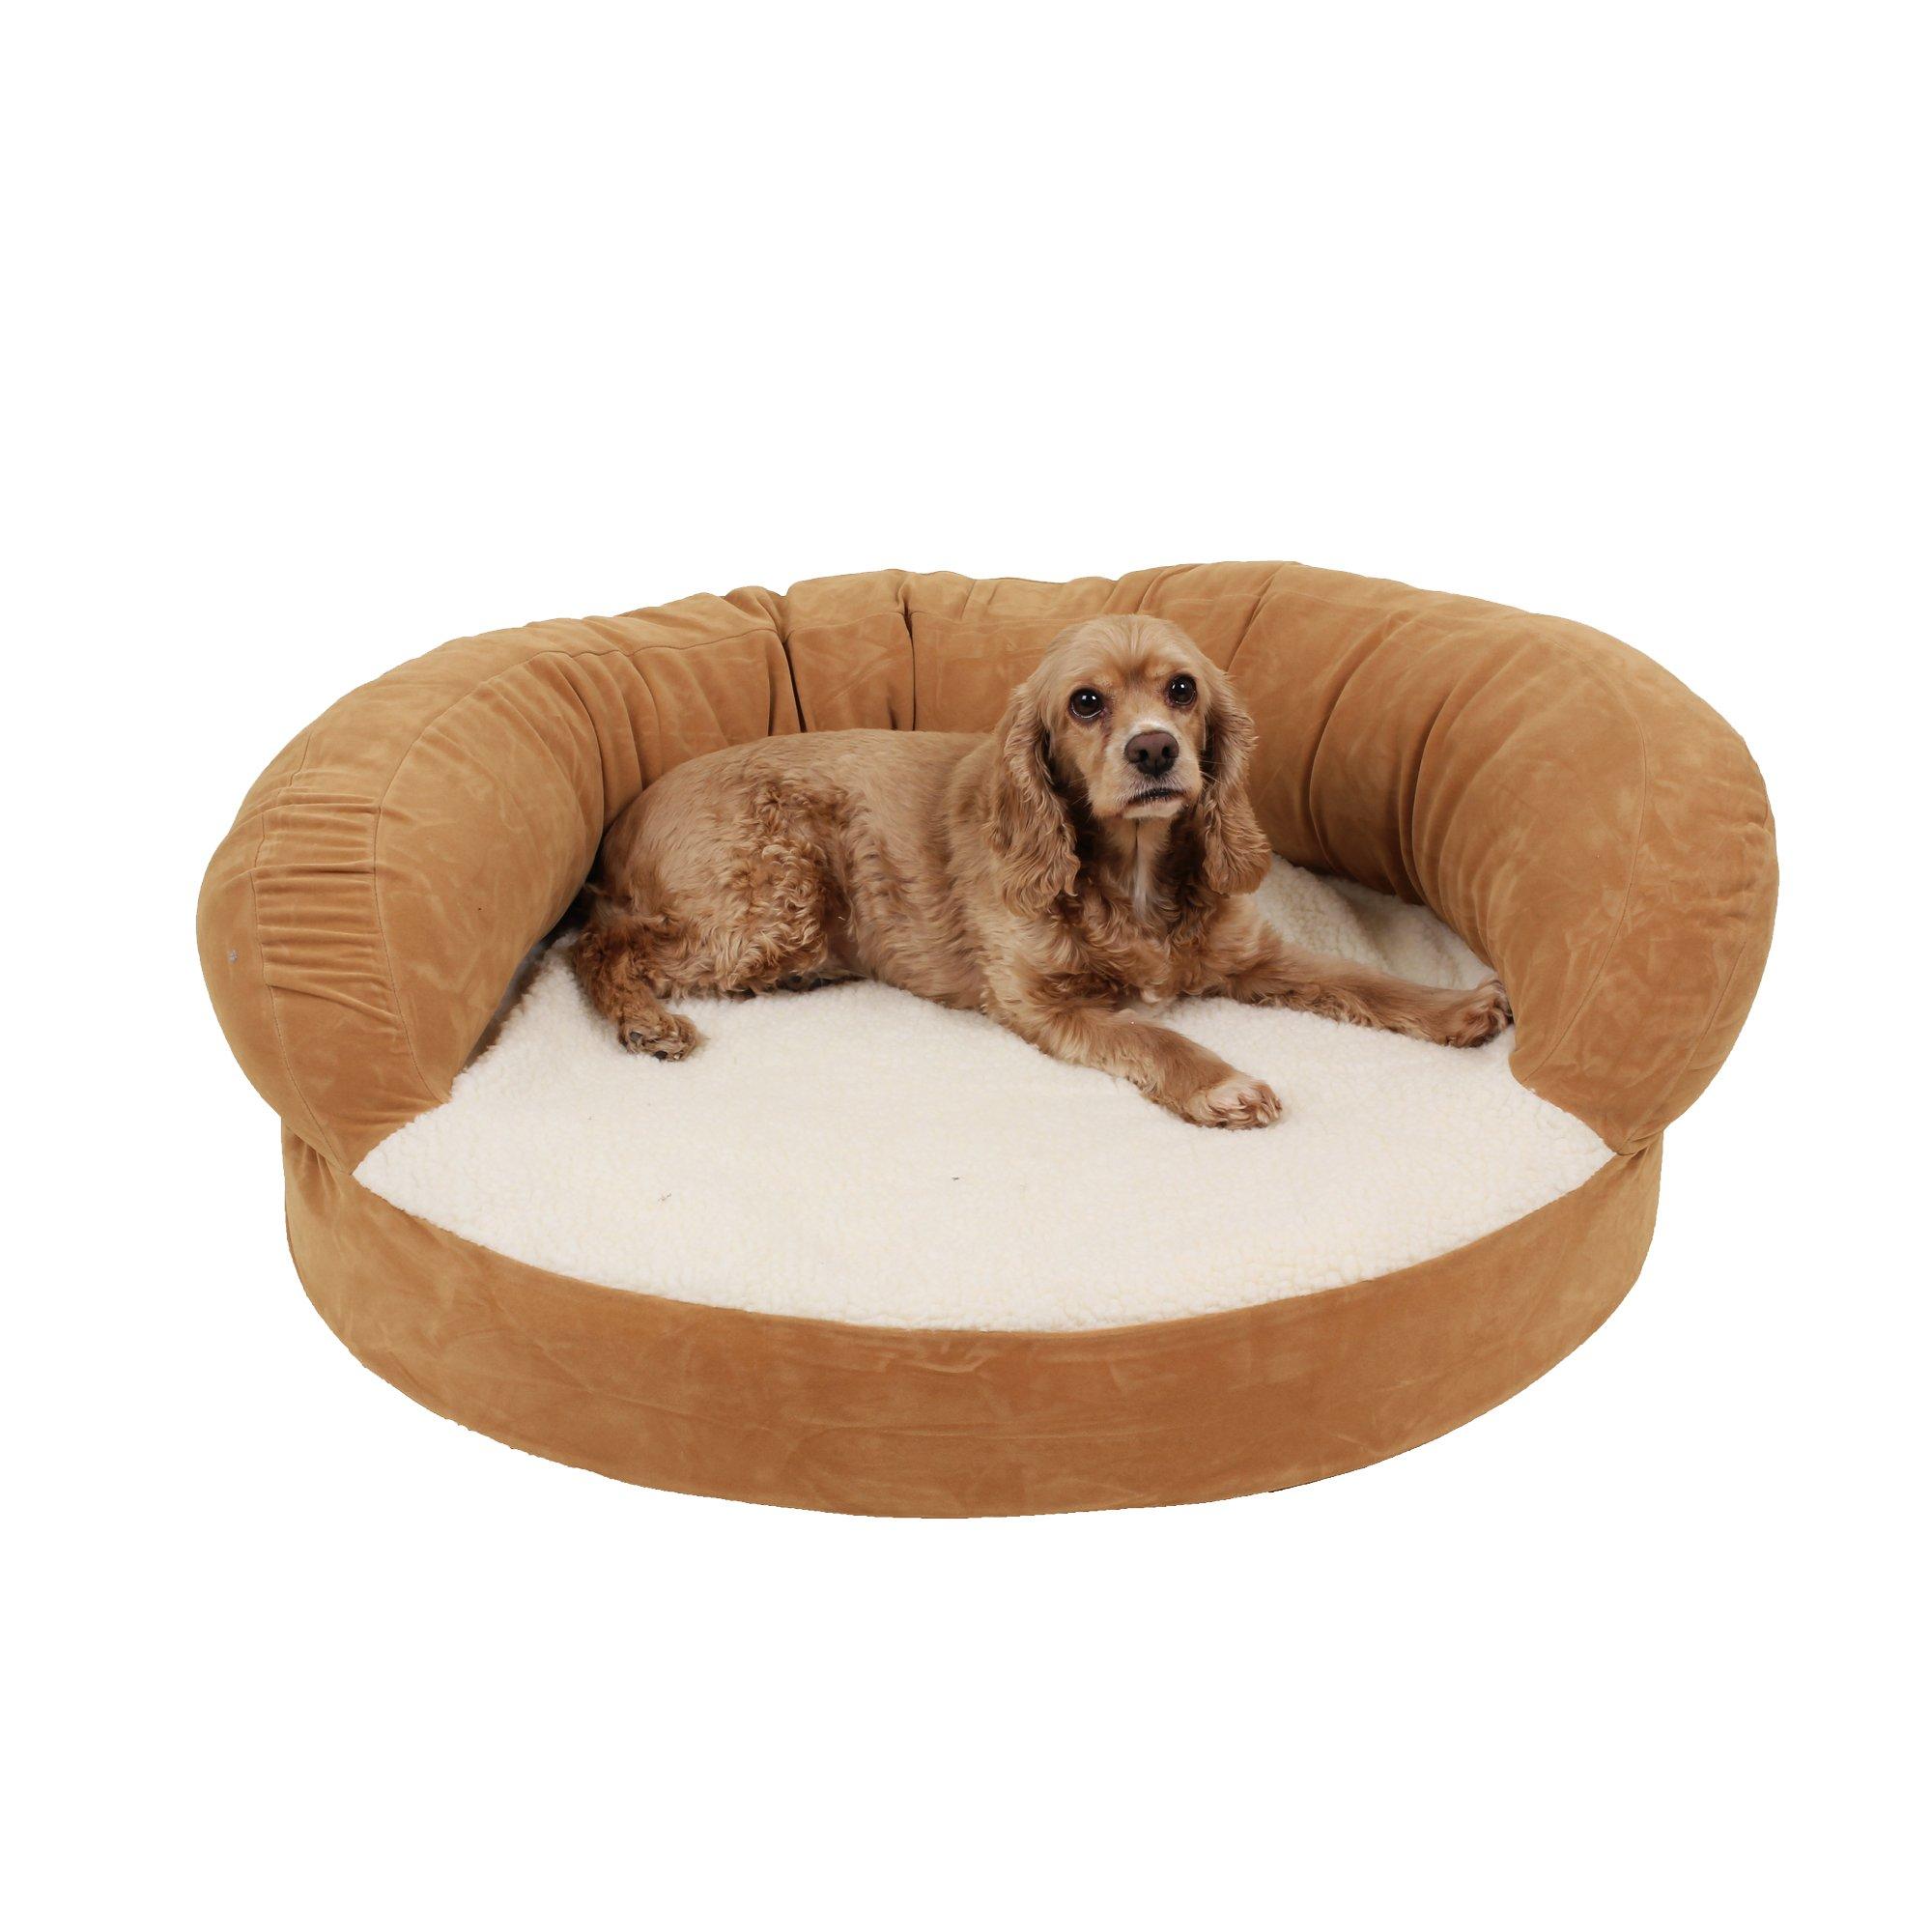 Carolina Pet Company Caramel Colored Orthopedic Bolster Personalized Dog Bed